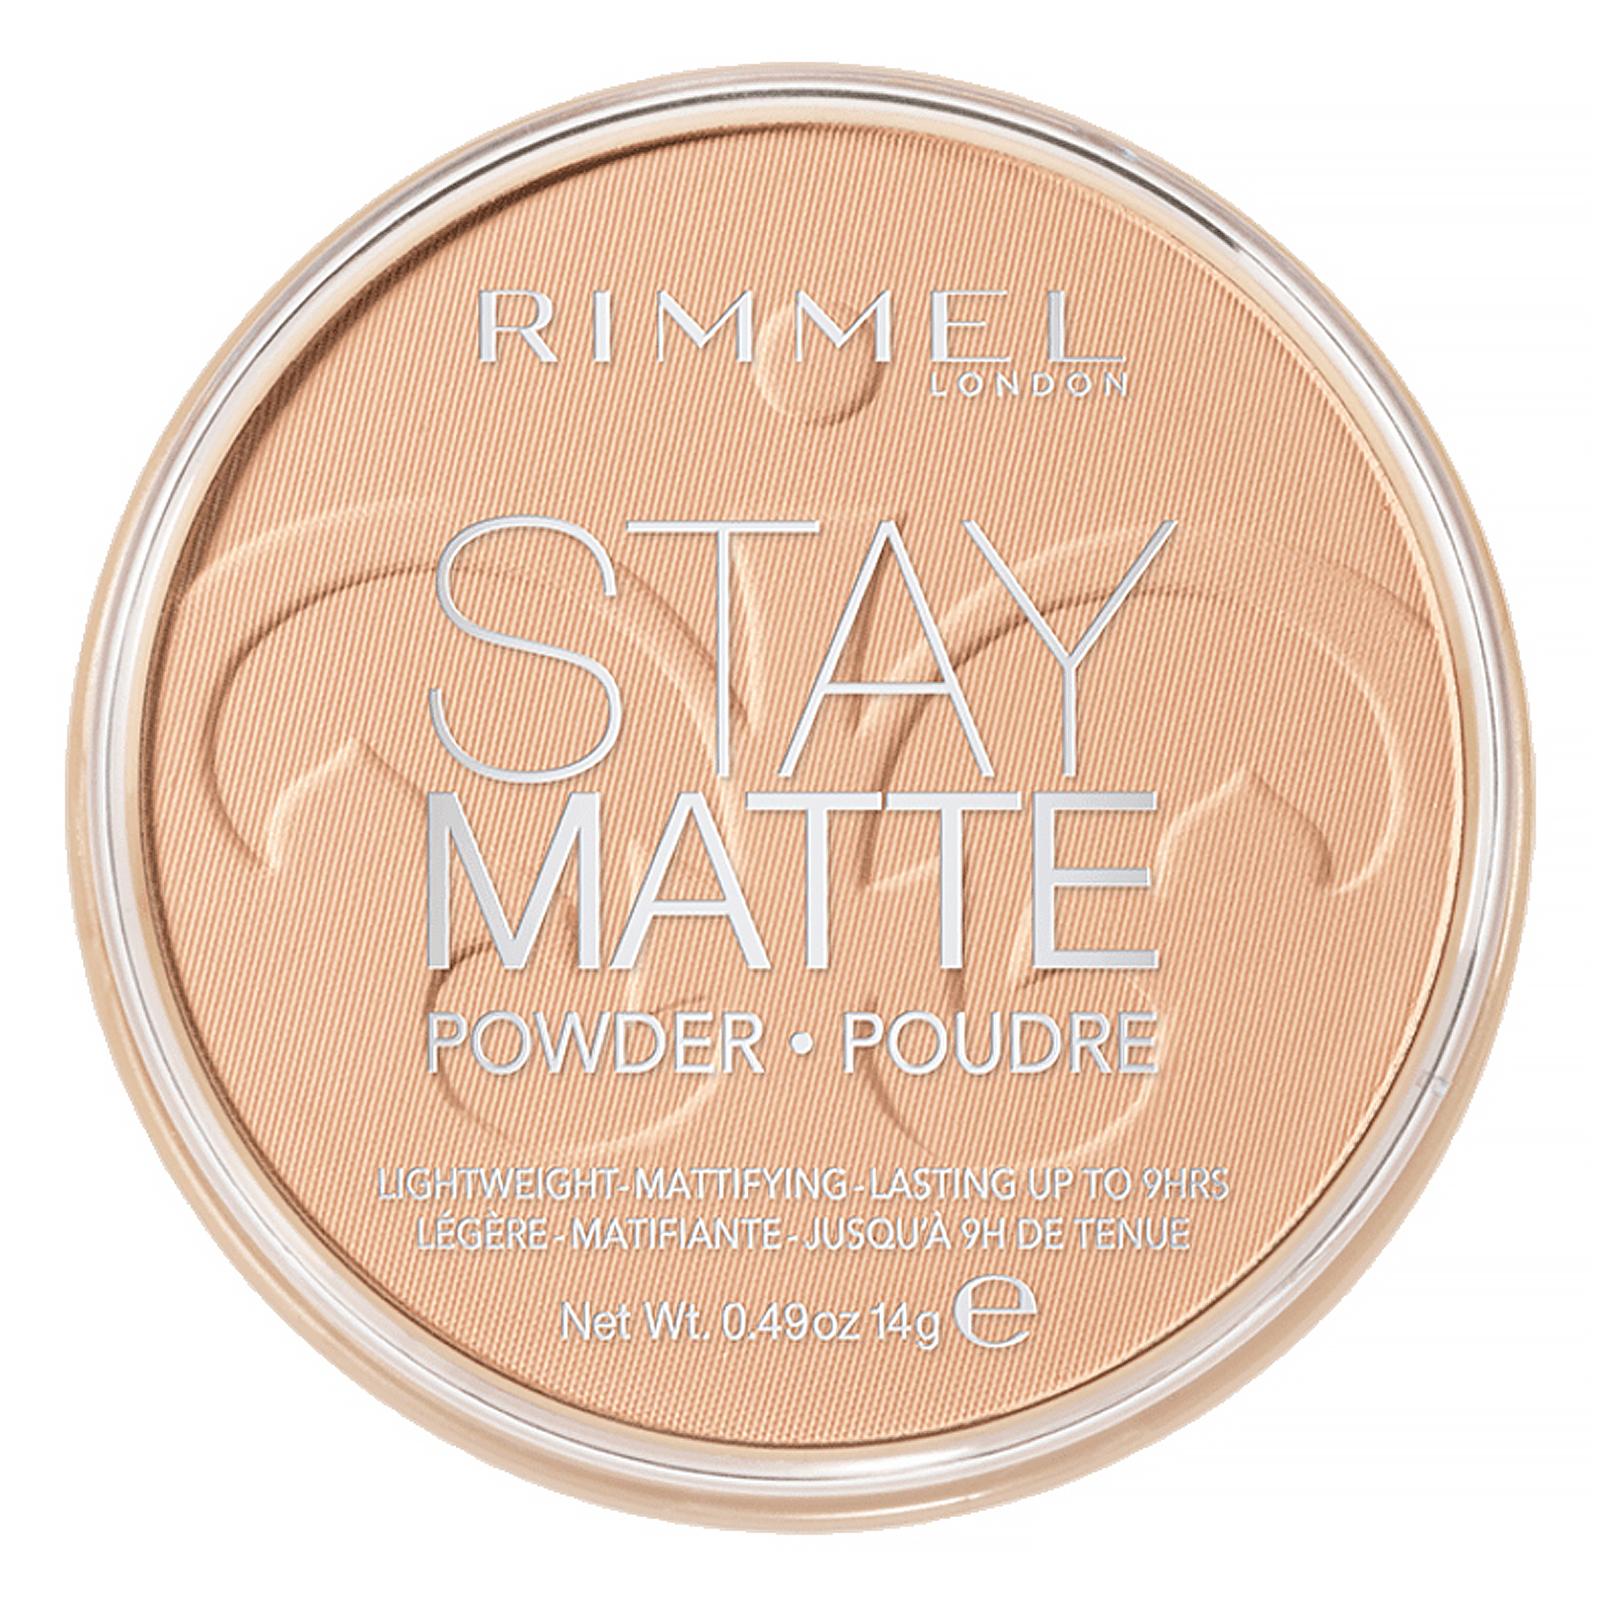 Rimmel London, Stay Matte, компактная легкая пудра с матирующим эффектом, оттенок 004 «Песчаная буря», 14 г